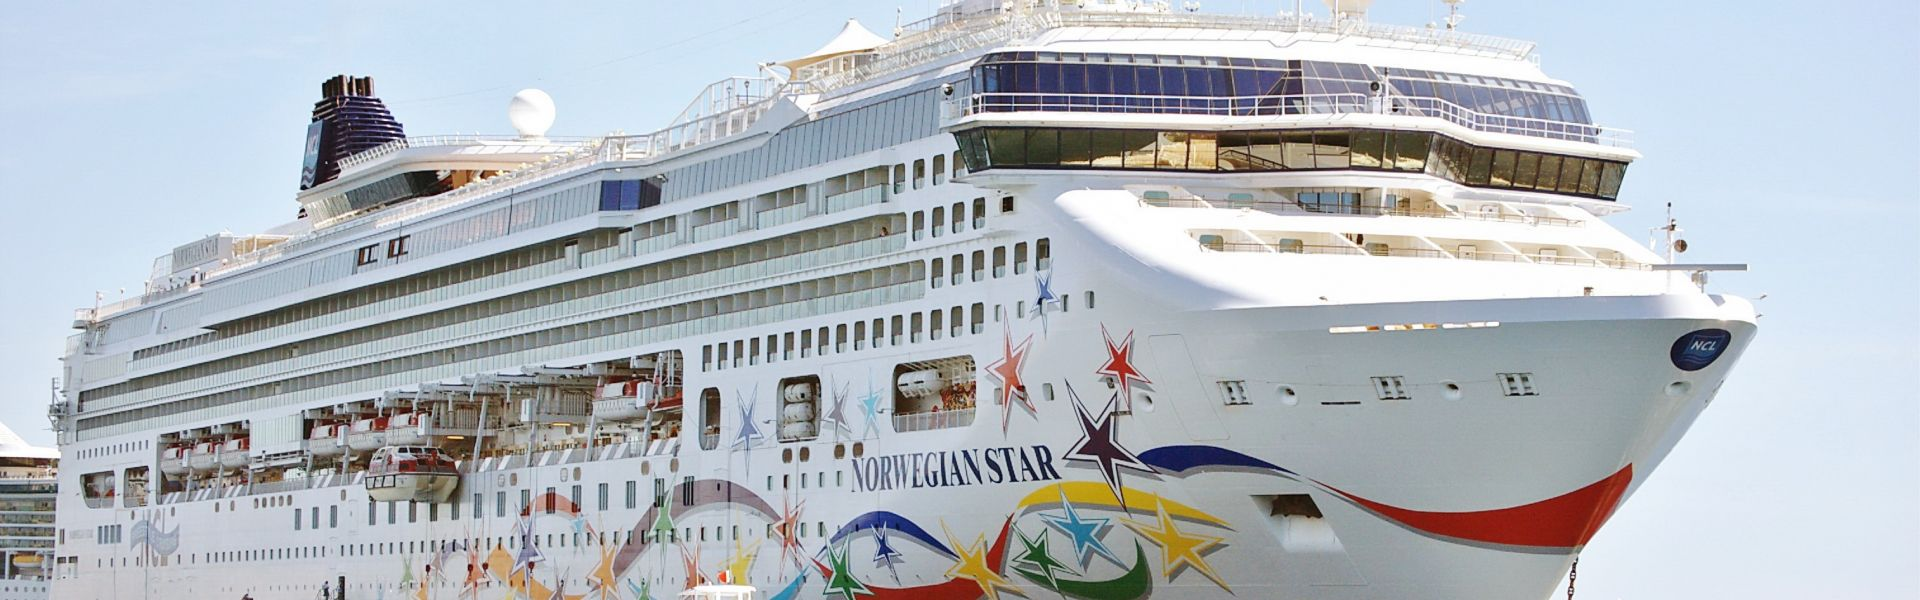 Croaziera 2018 - Riviera Mexicana (Los Angeles) - Norwegian Cruise Line - Norwegian Star - 7 nopti